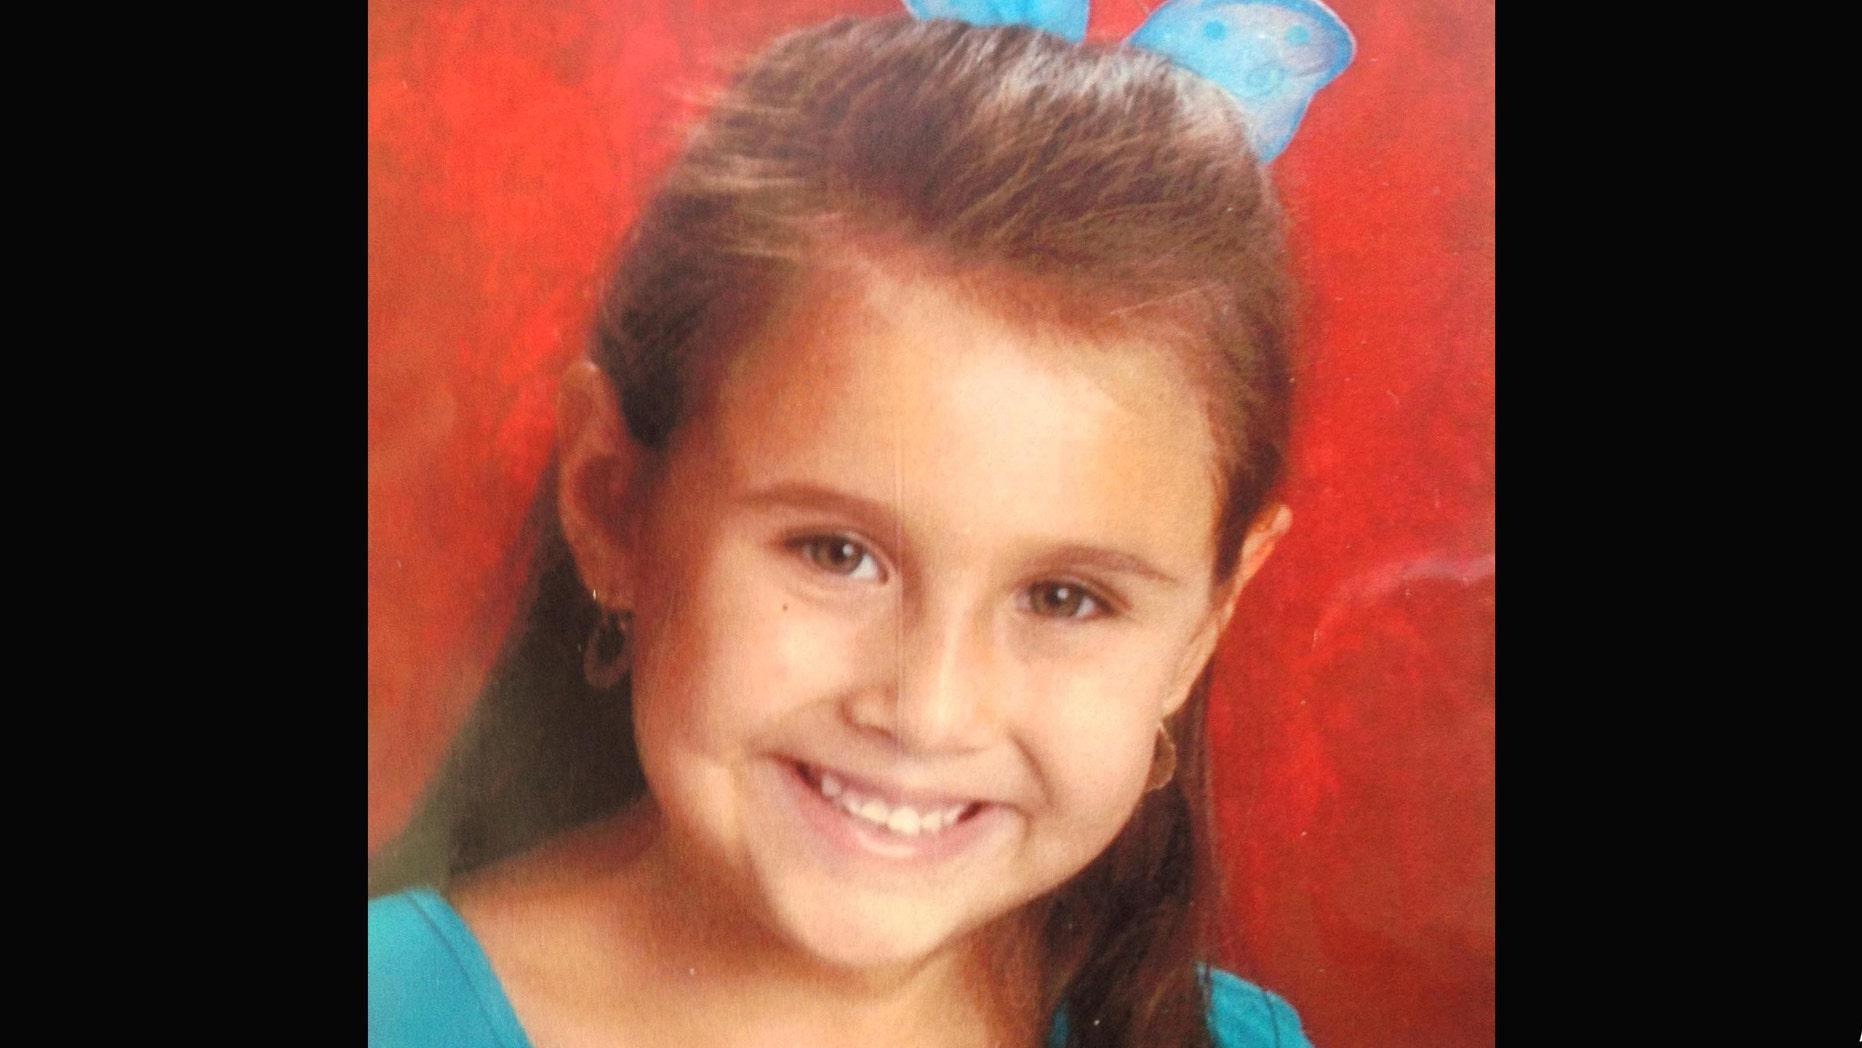 Isabel Mercedes Celis, 6, disappeared on April 21st.